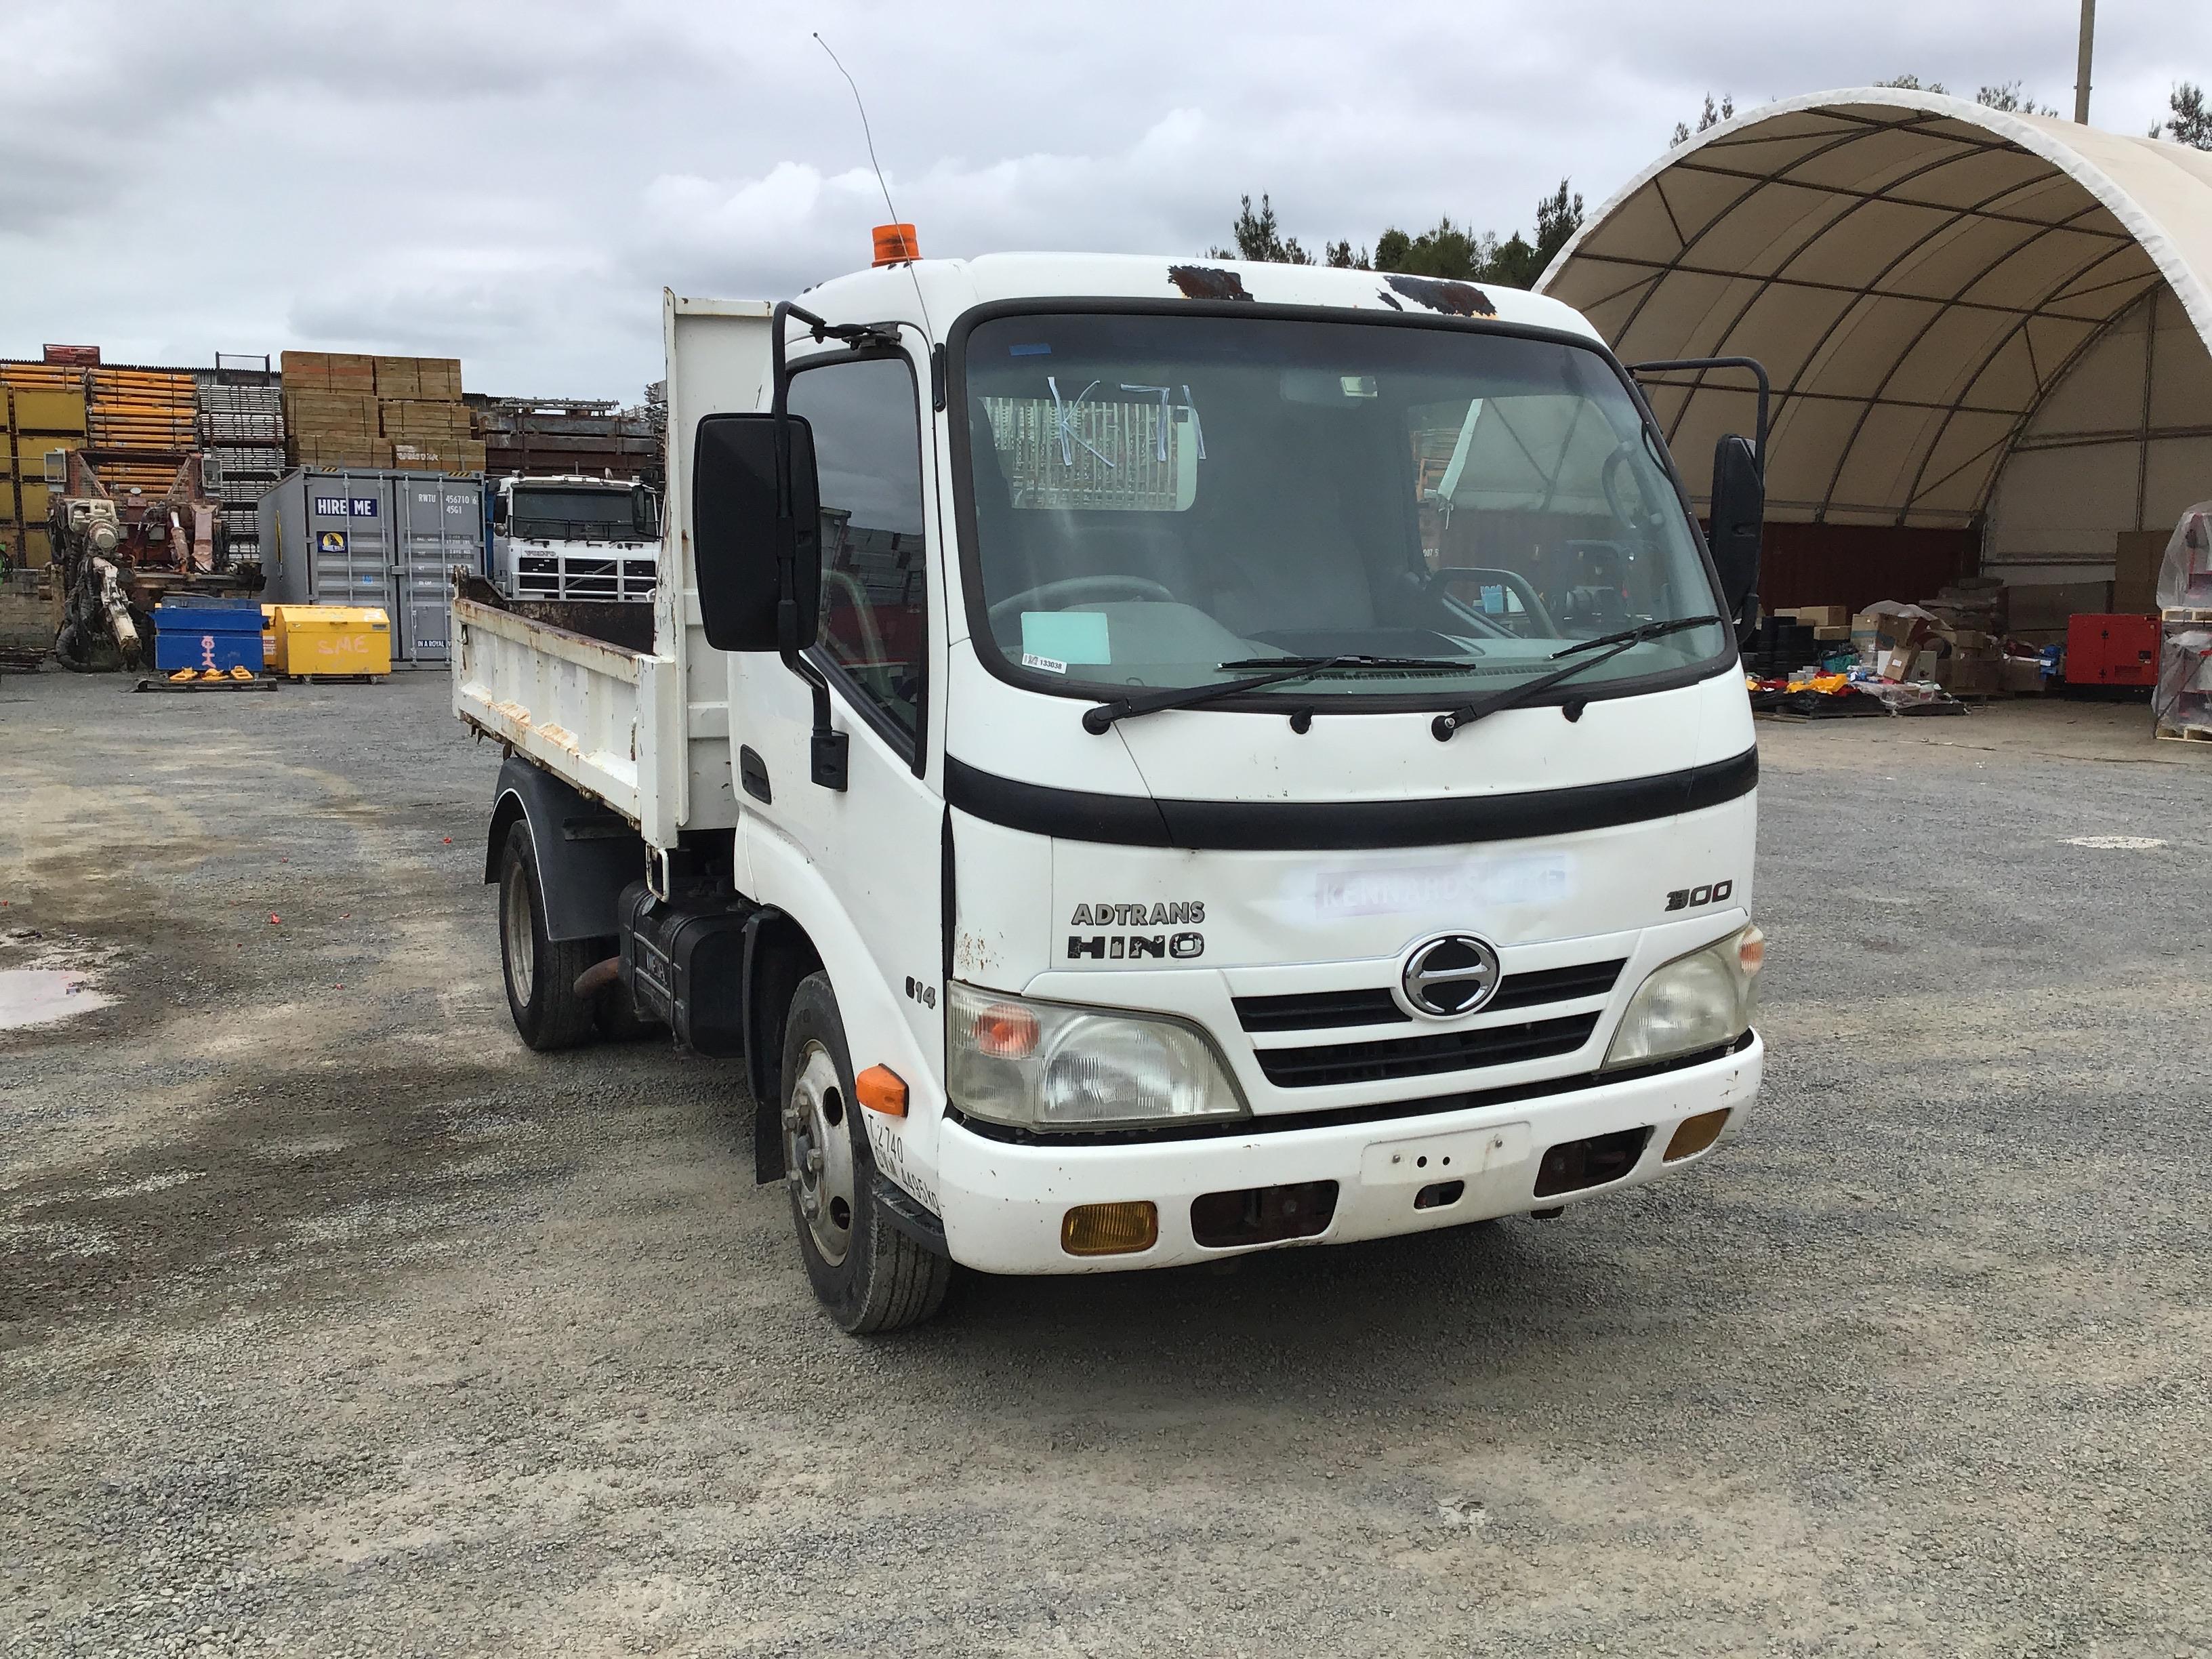 2009 Hino 300 4 x 2 Tipper Truck